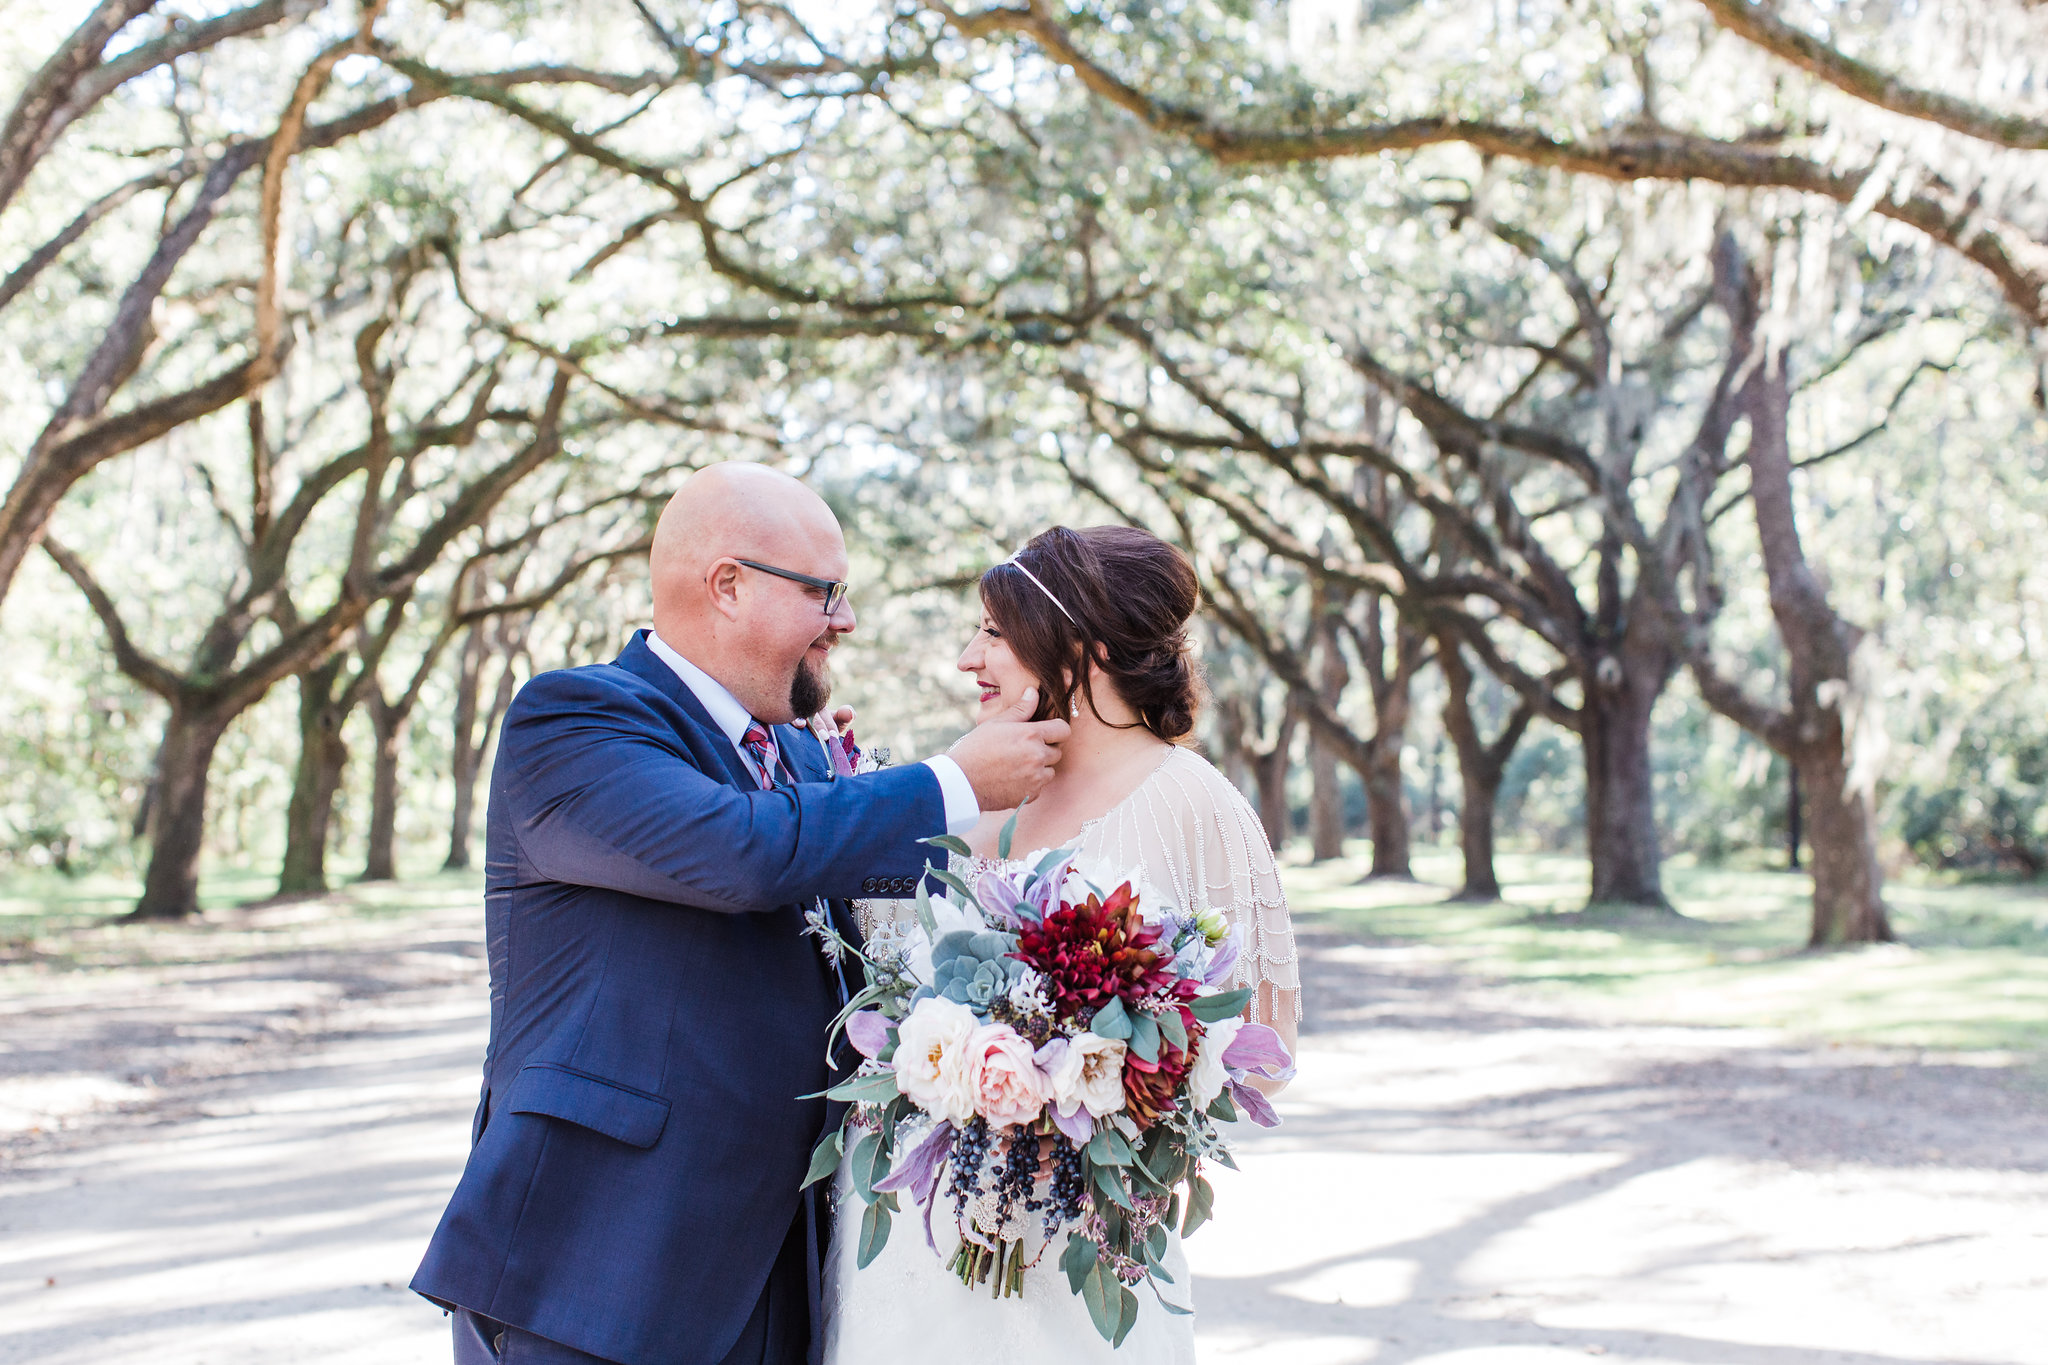 apt-b-photography-kristy-rob-wormsloe-elopment-savannah-wedding-photographer-savannah-elopement-wormsloe-wedding-historic-savannah-elopement-photographer-25.jpg